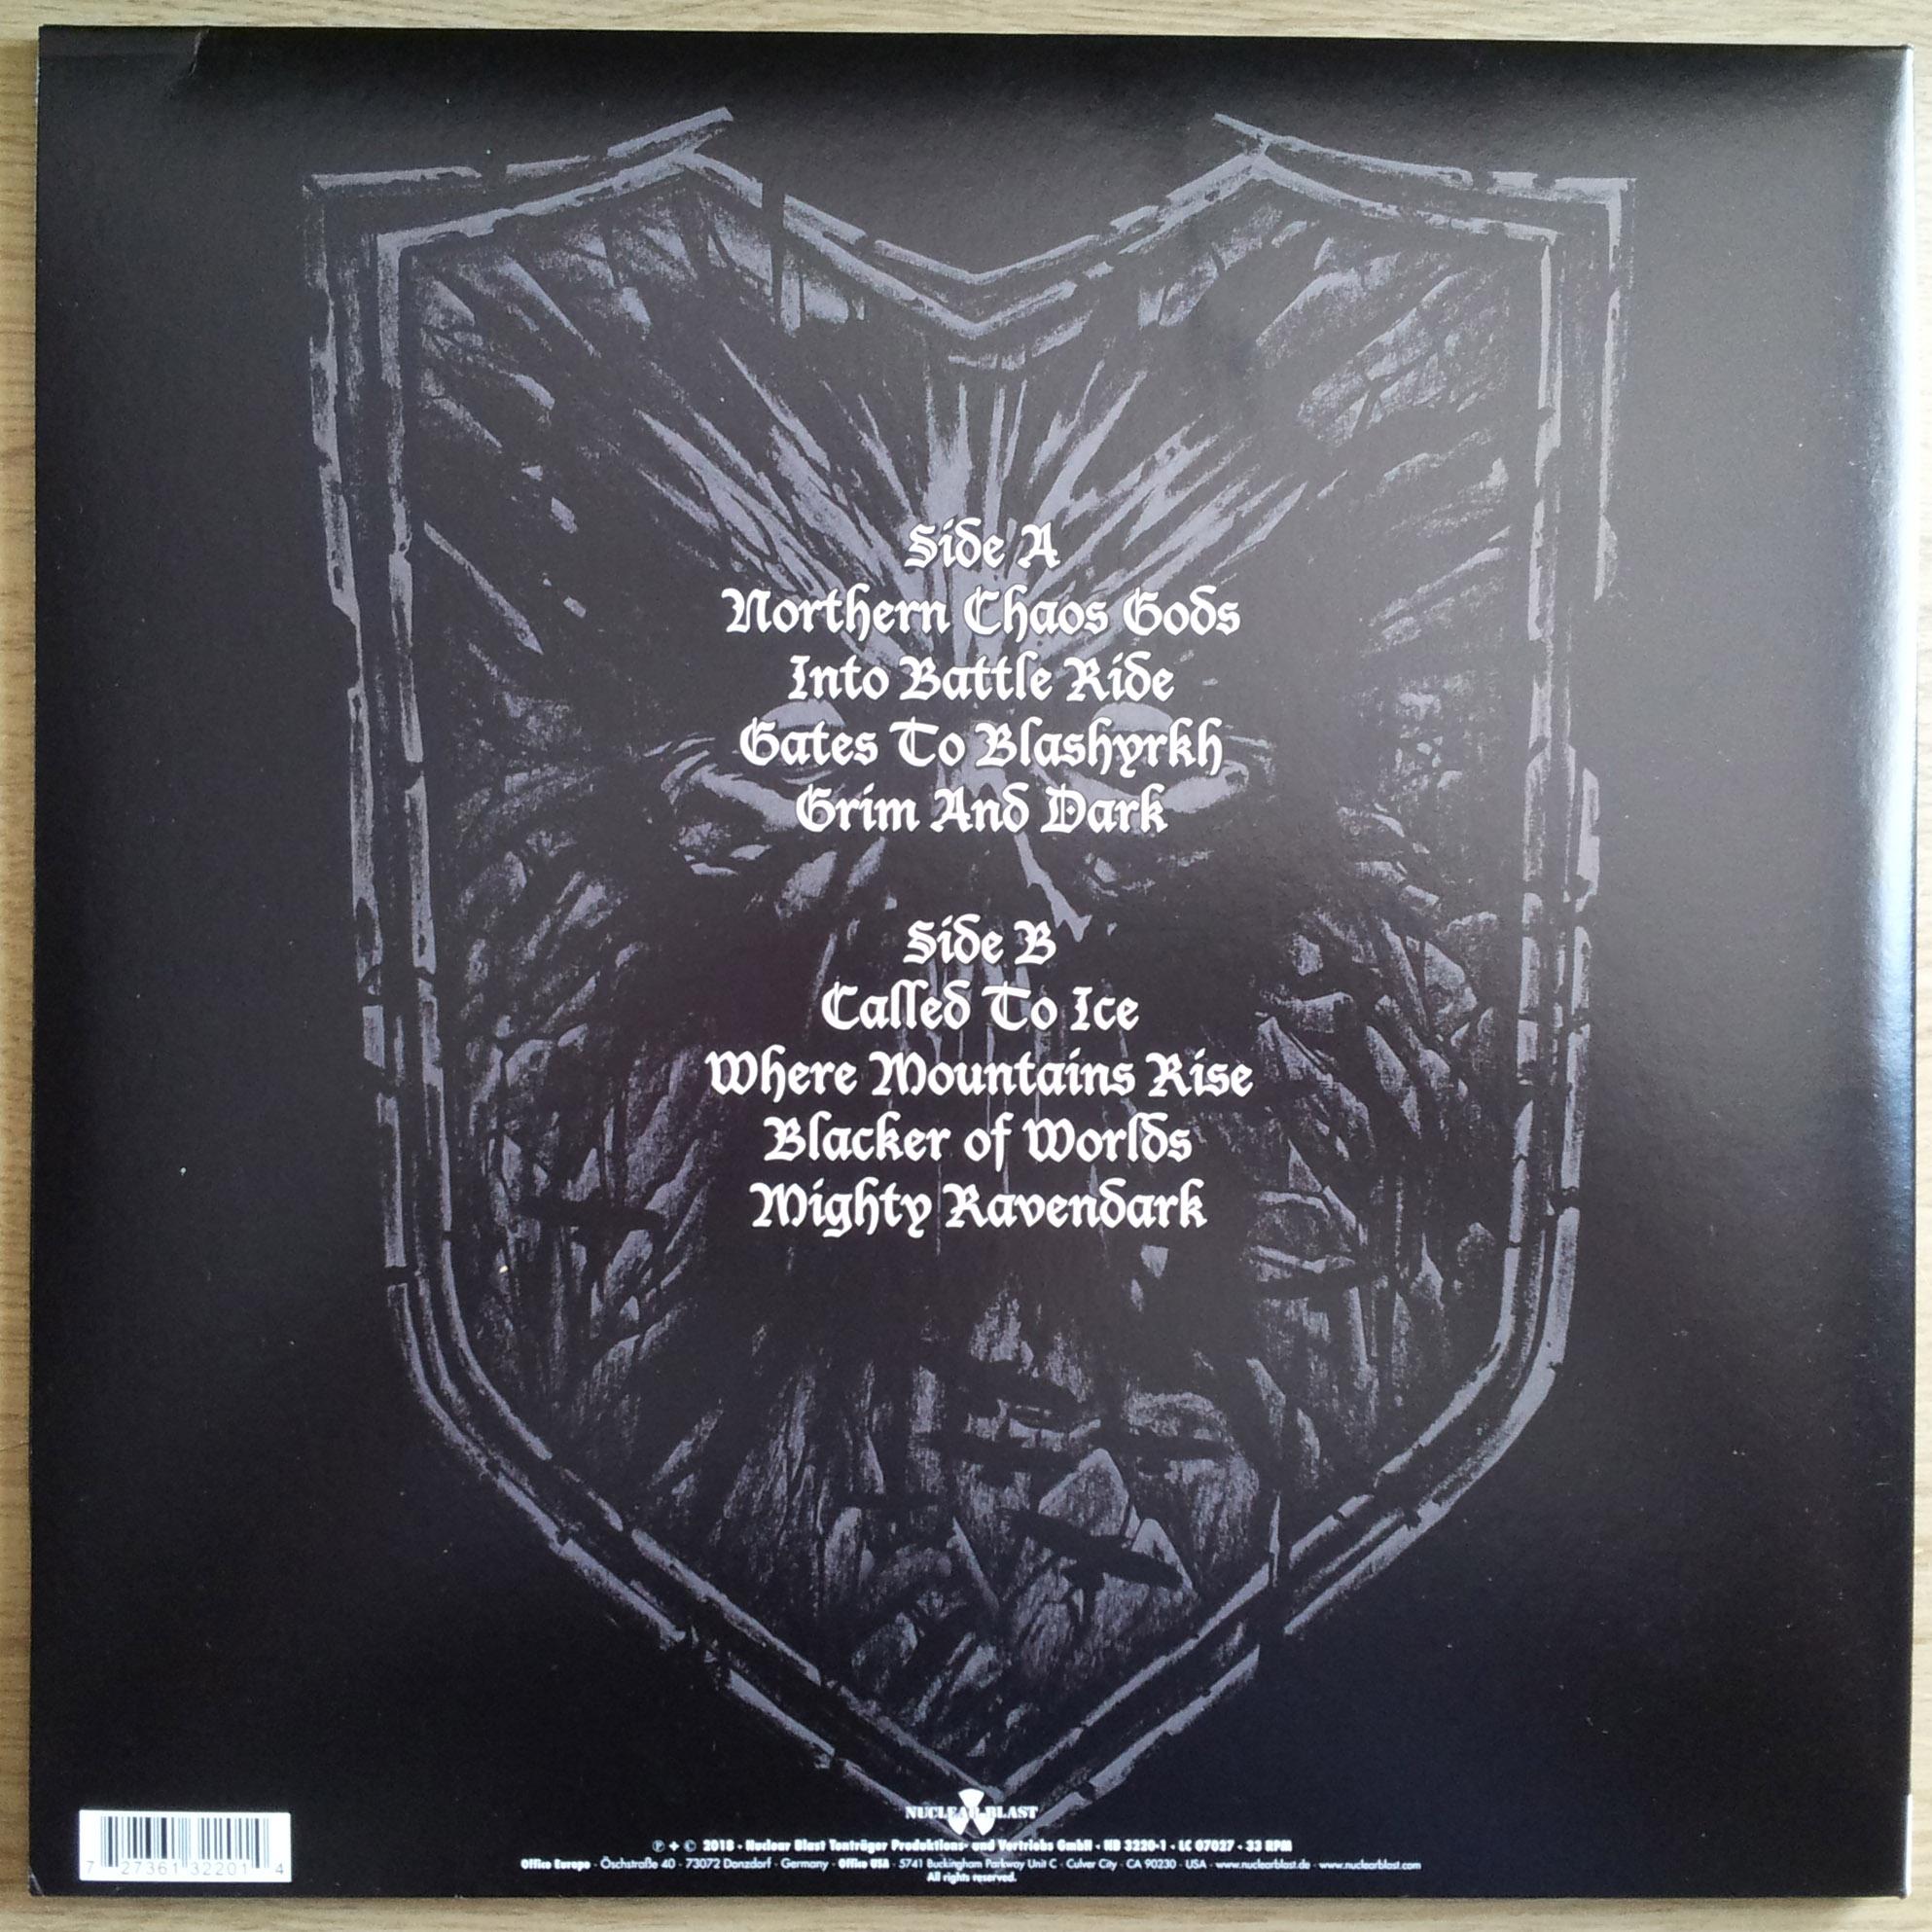 IMMORTAL Northern Chaos Gods (2018) Black Metal Norvège 0310